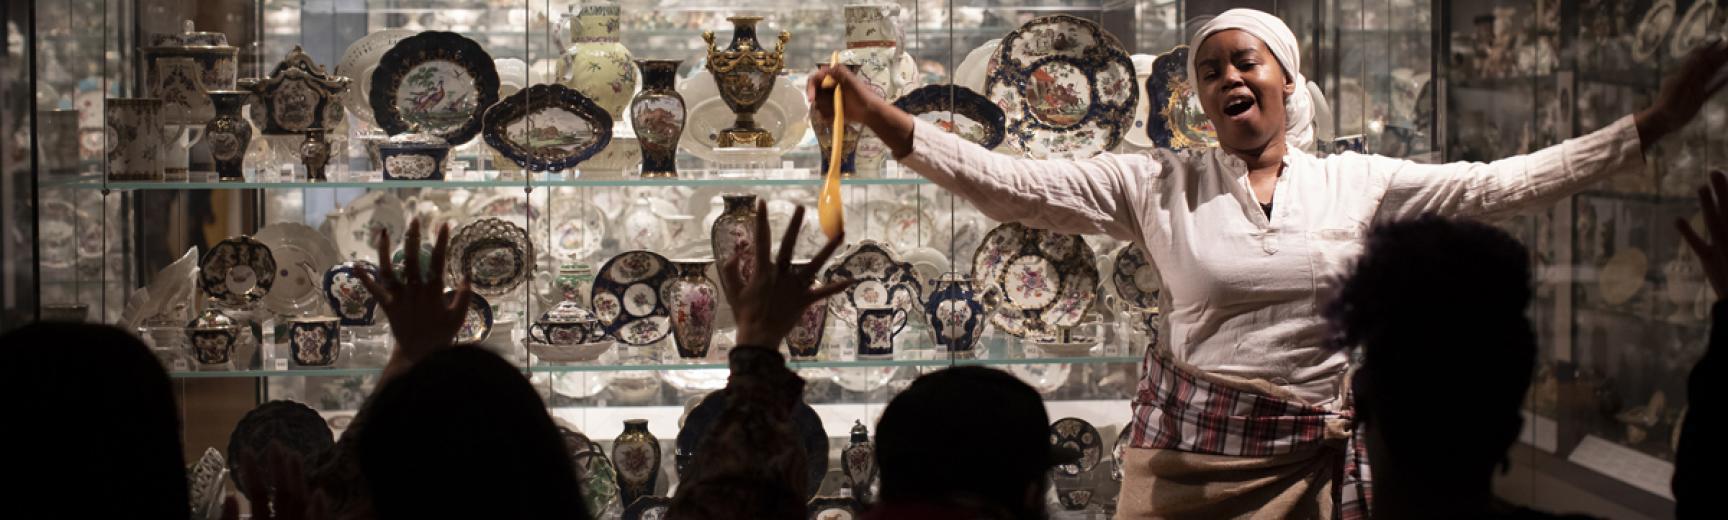 A Nice Cup of Tea? event in the Ashmolean European Ceramics Gallery